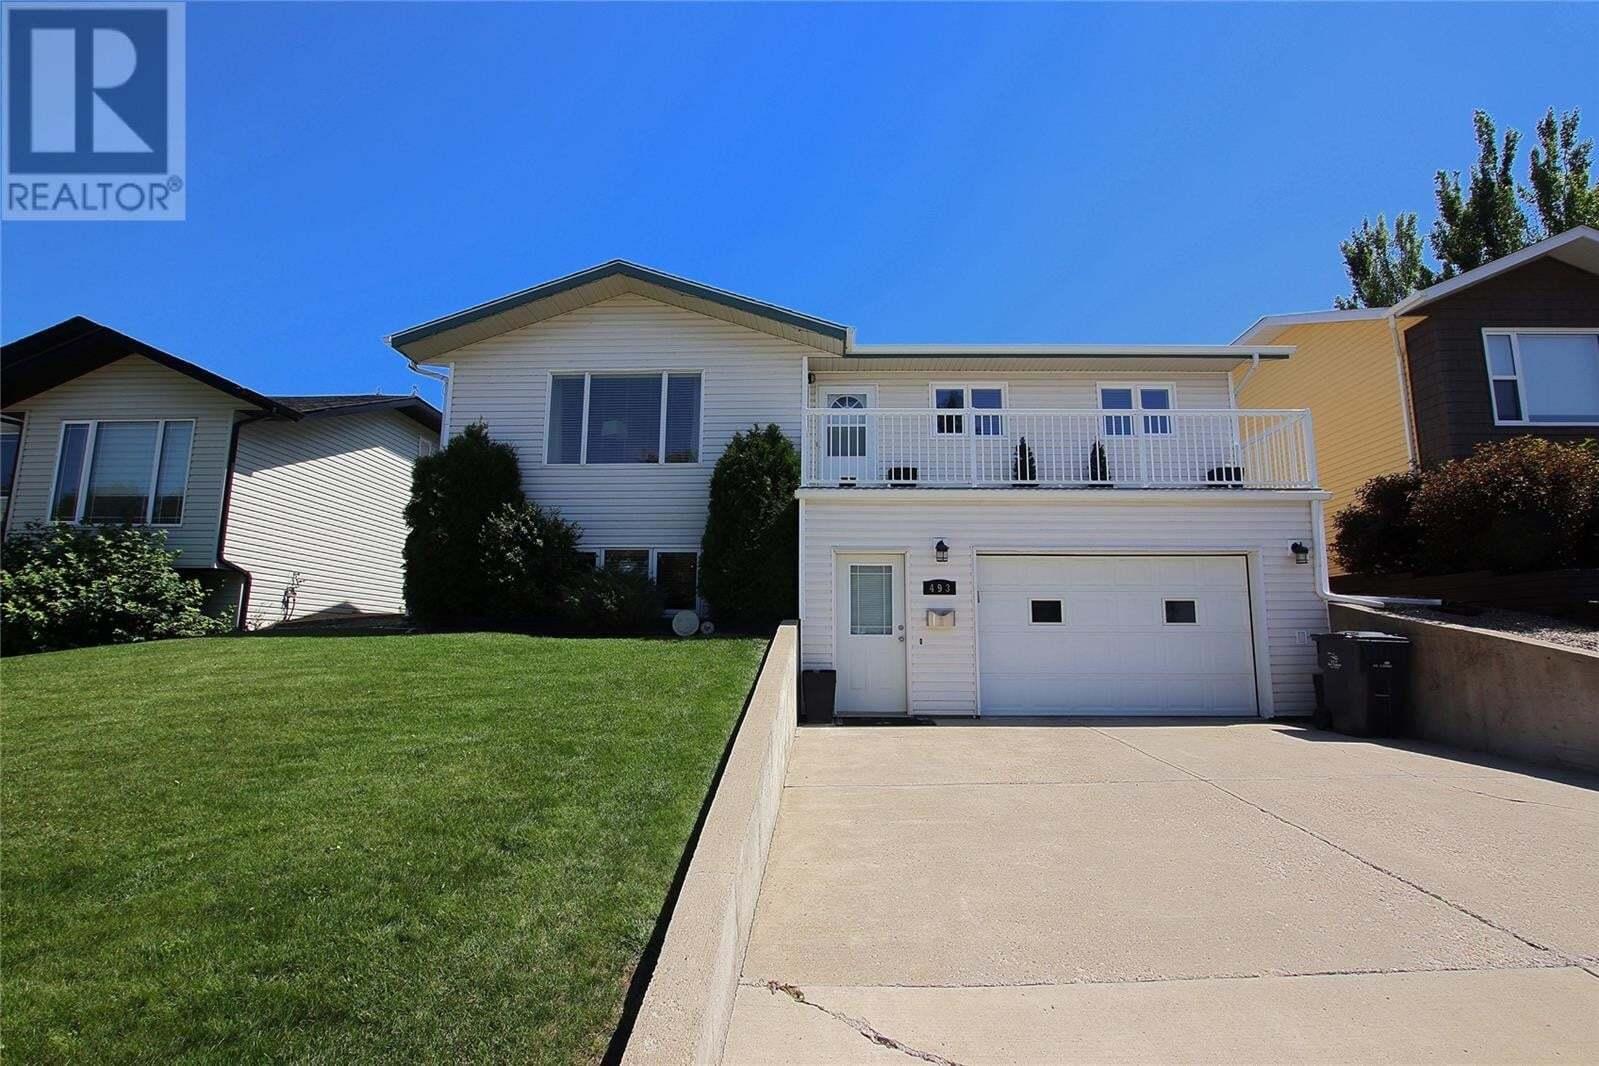 House for sale at 493 4th Ave SE Swift Current Saskatchewan - MLS: SK819626